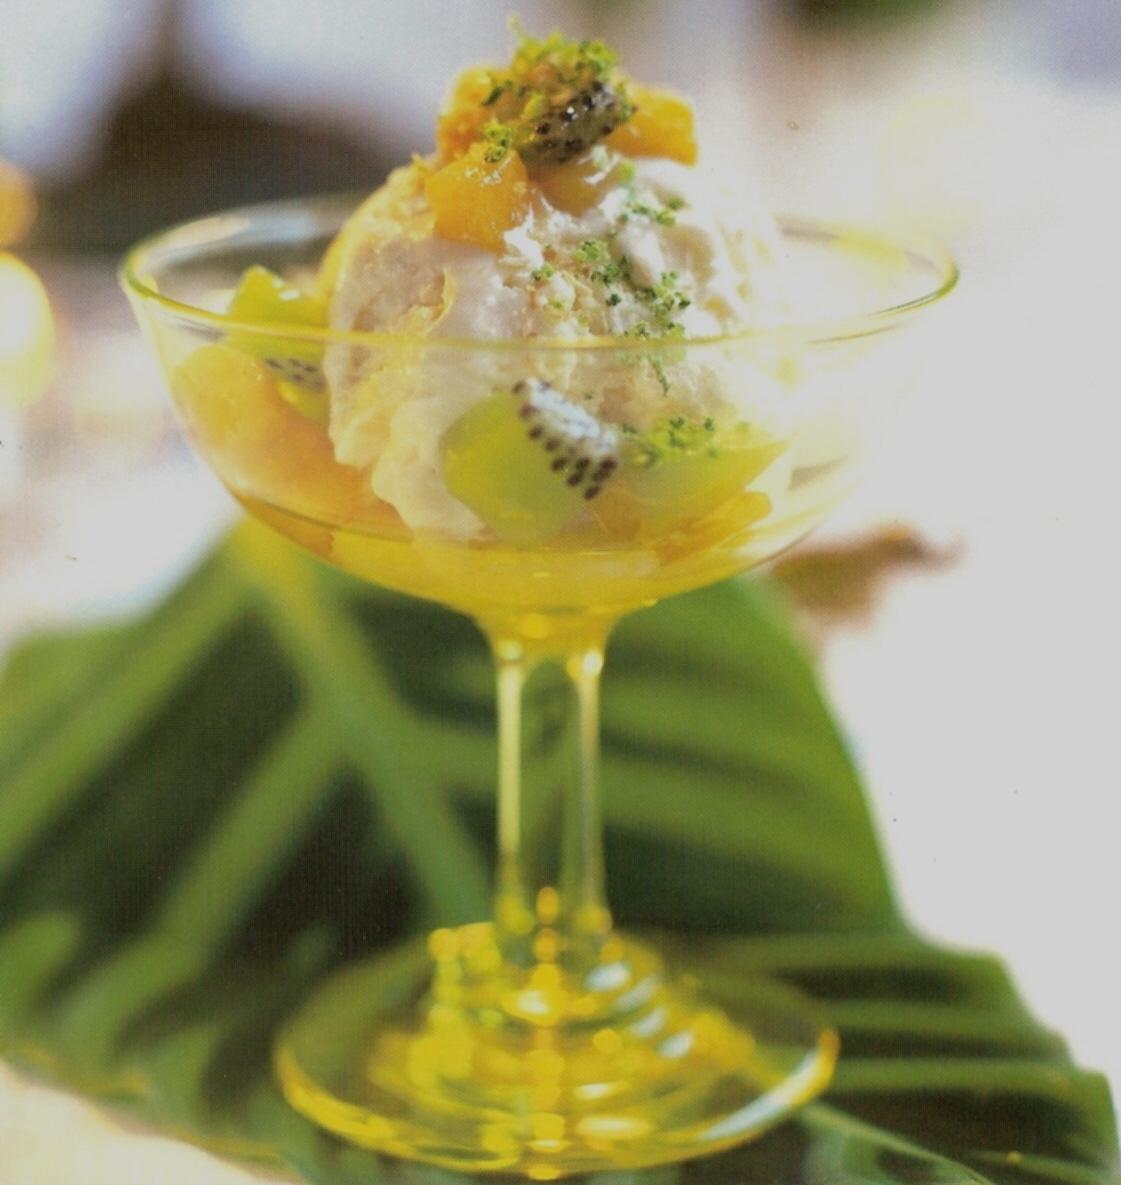 Kokosglass med frukt i lime